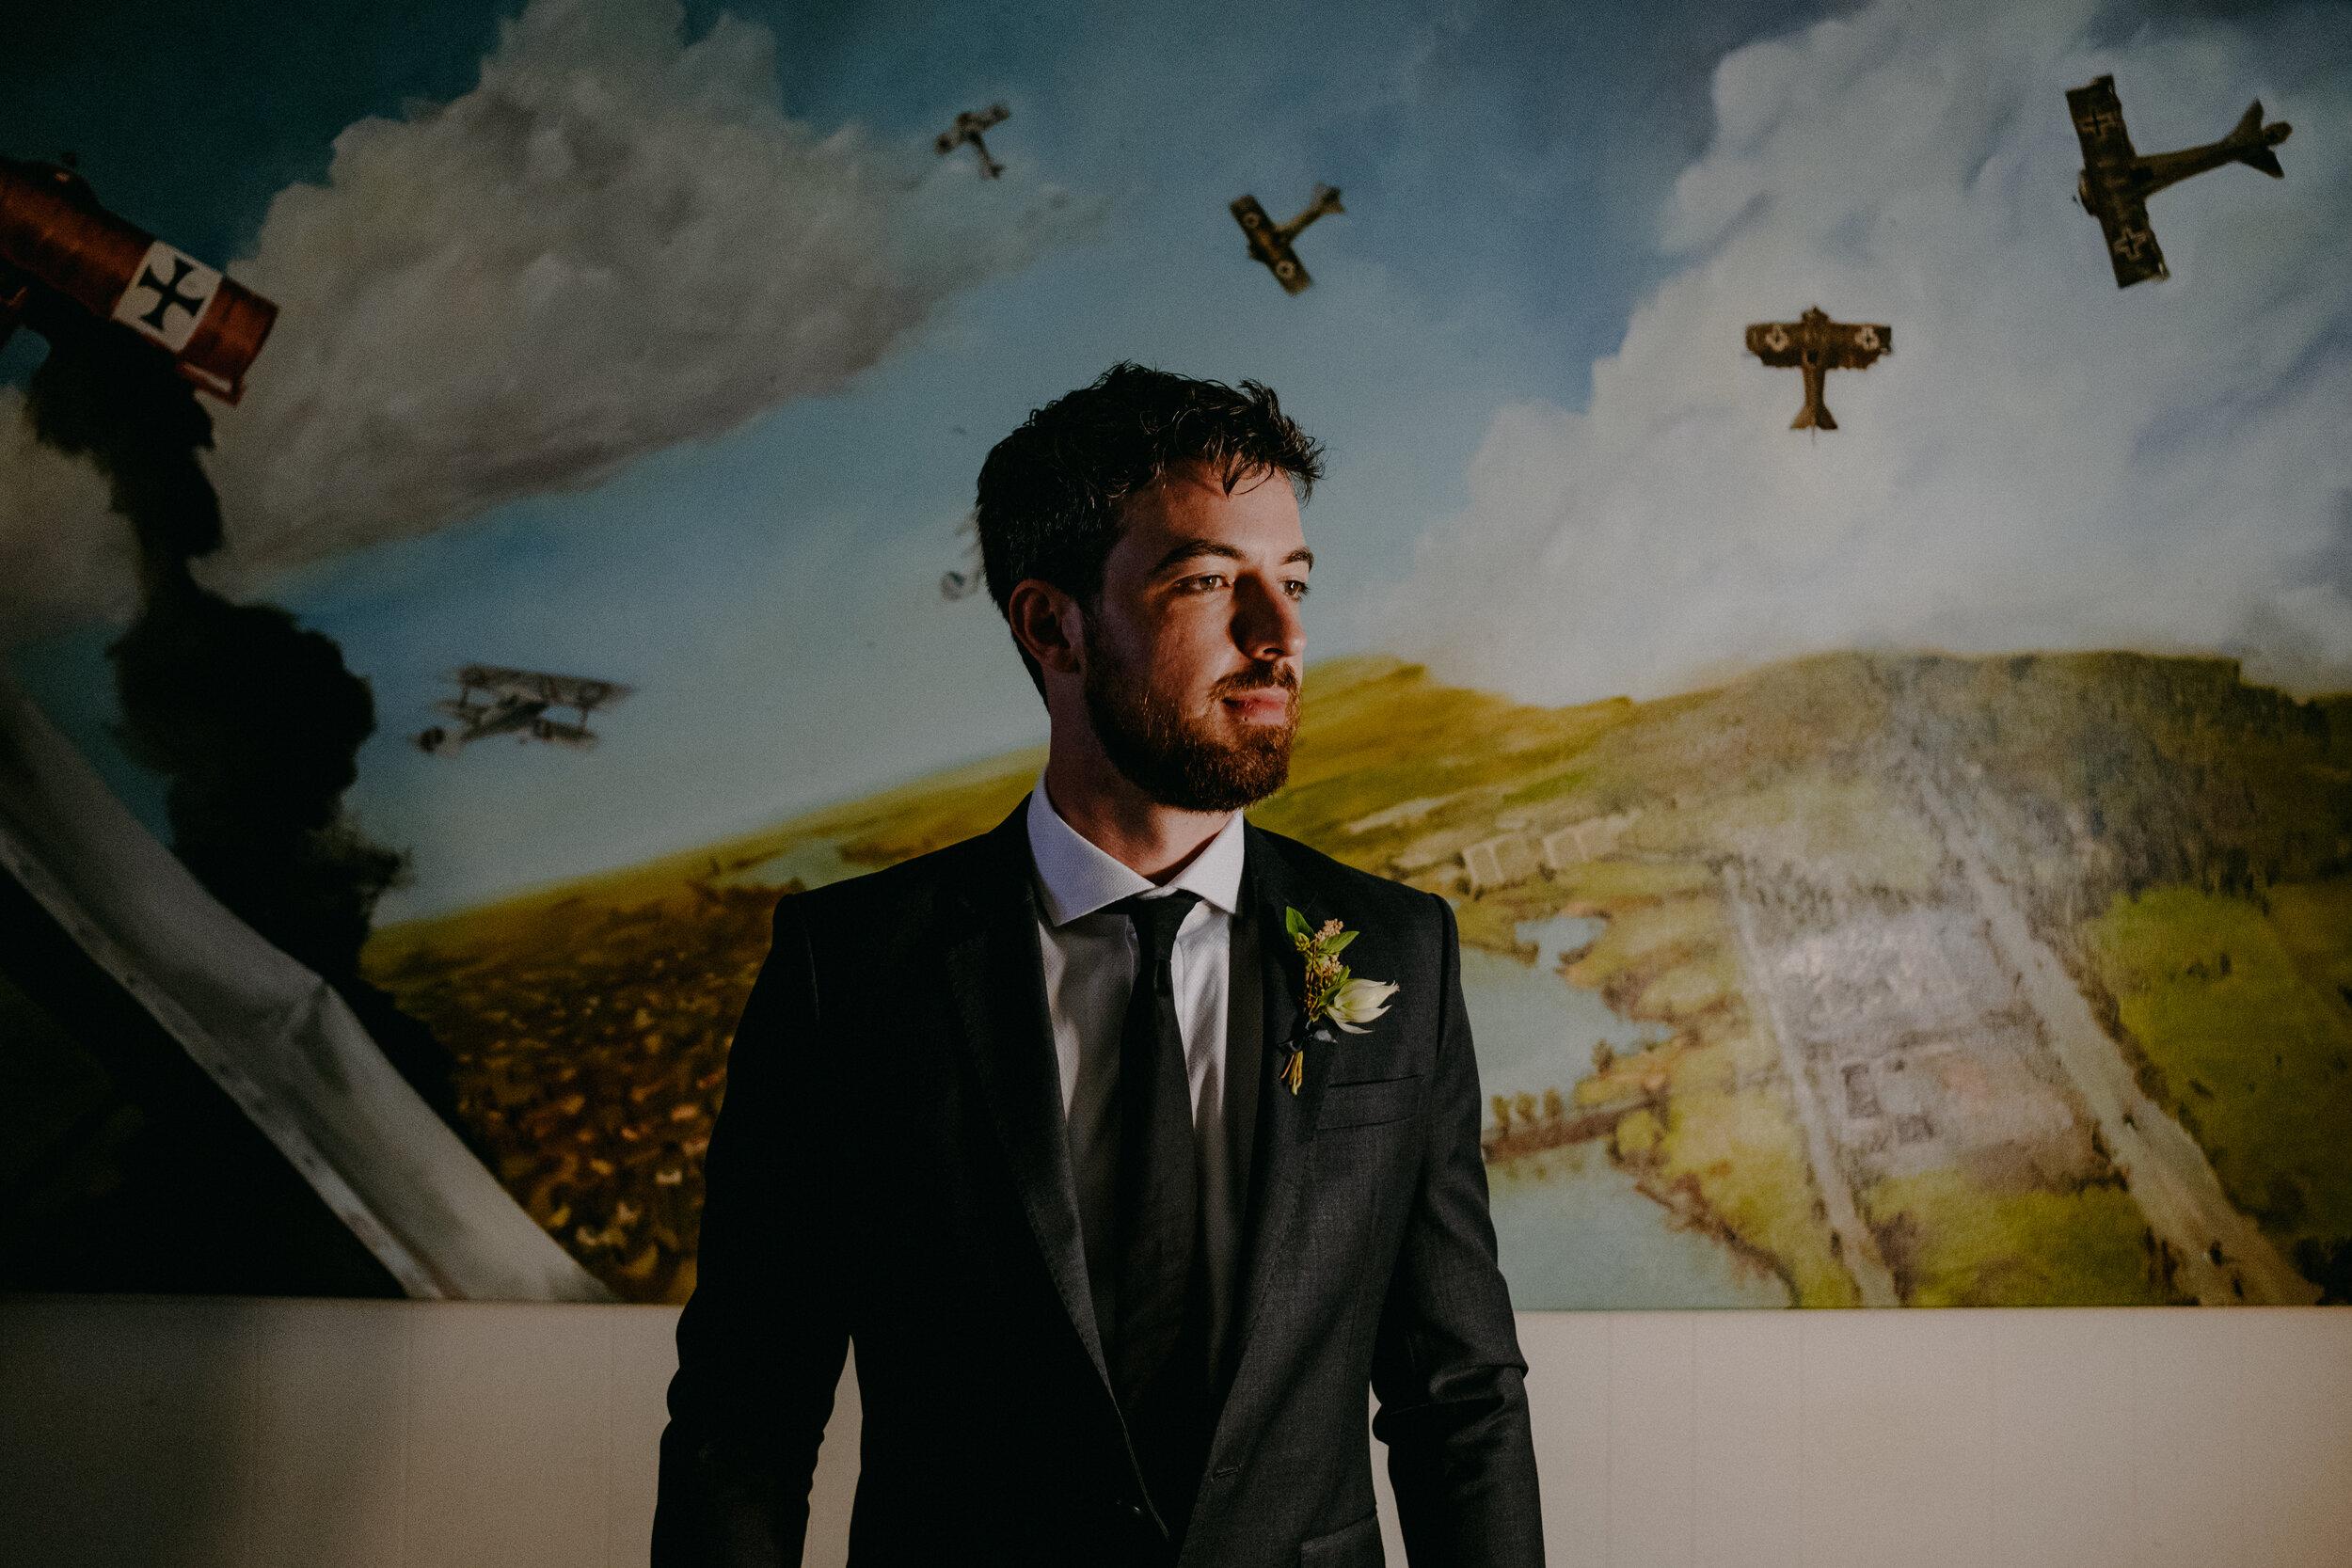 Aurora_Brooklyn_Wedding_Photographer_Chellise_Michael_Photography-22.jpg